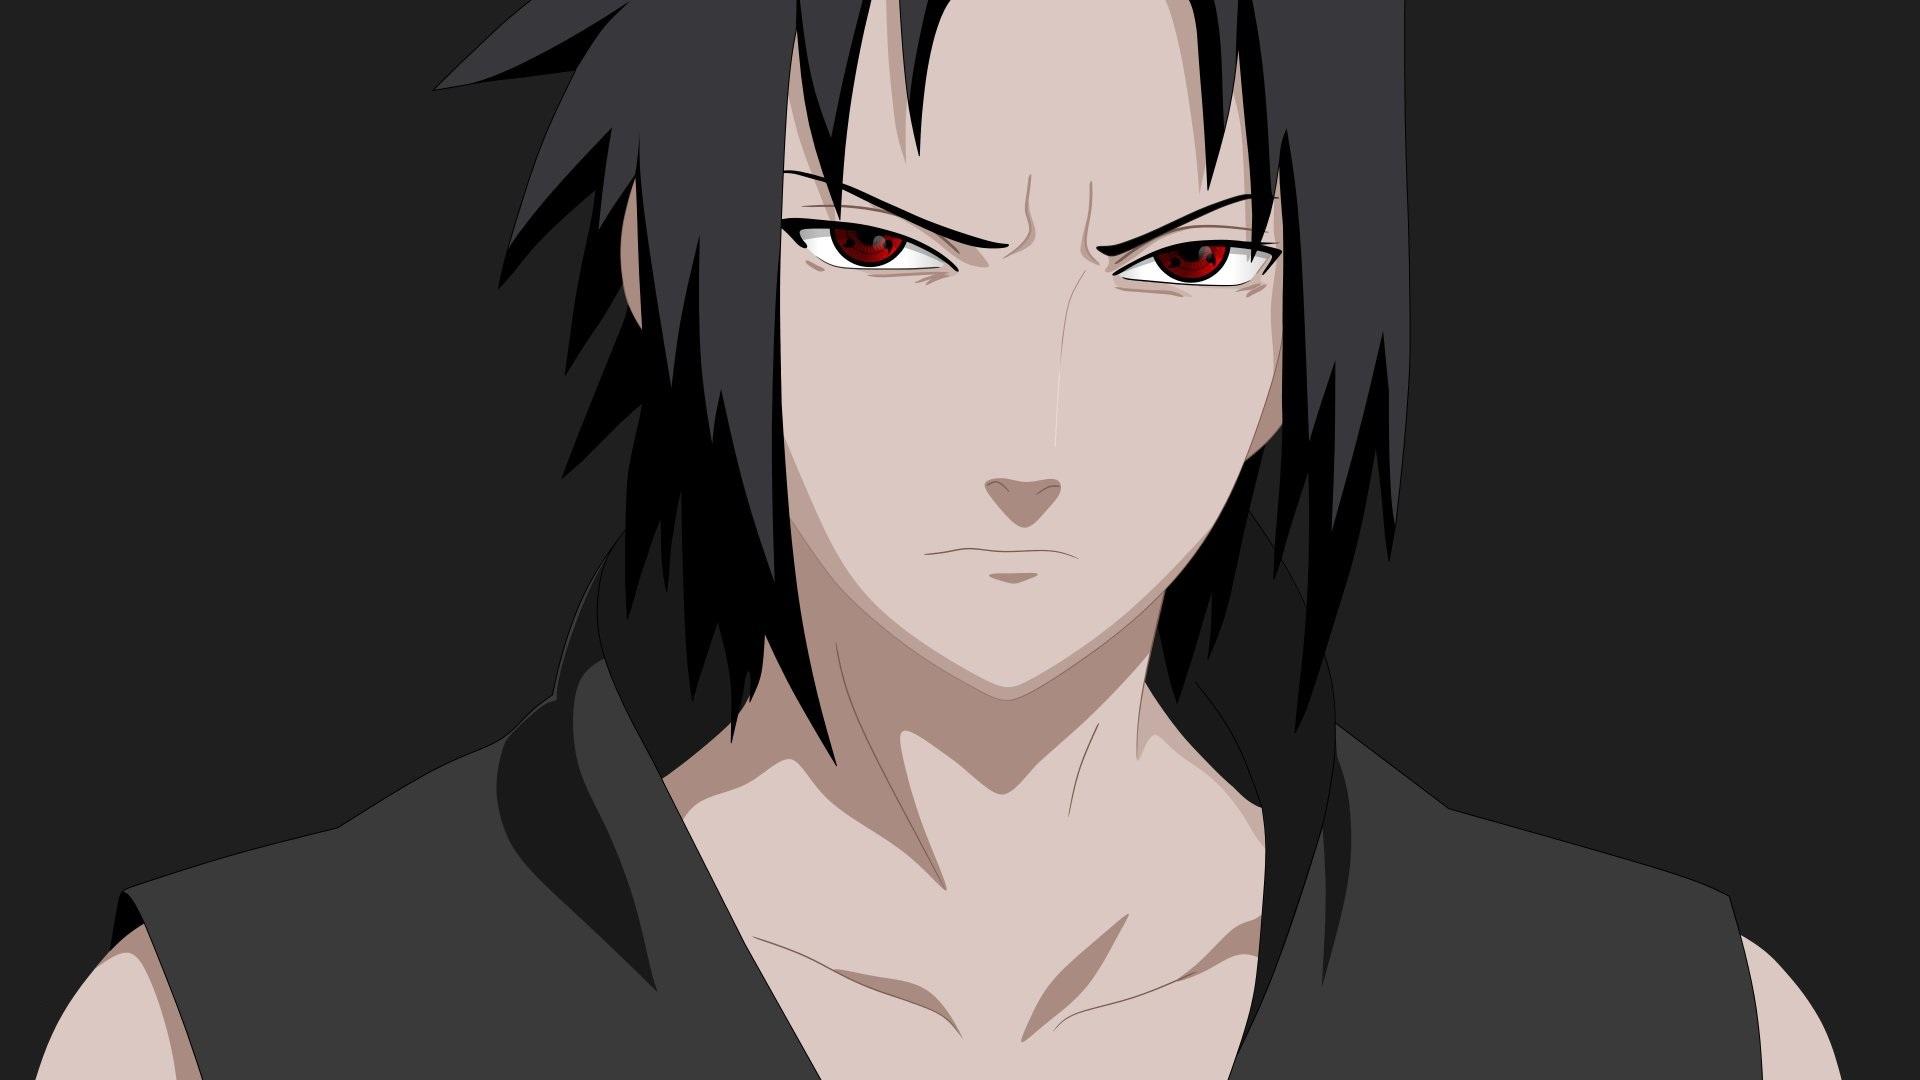 Sasuke Uchiha For Desktop Background